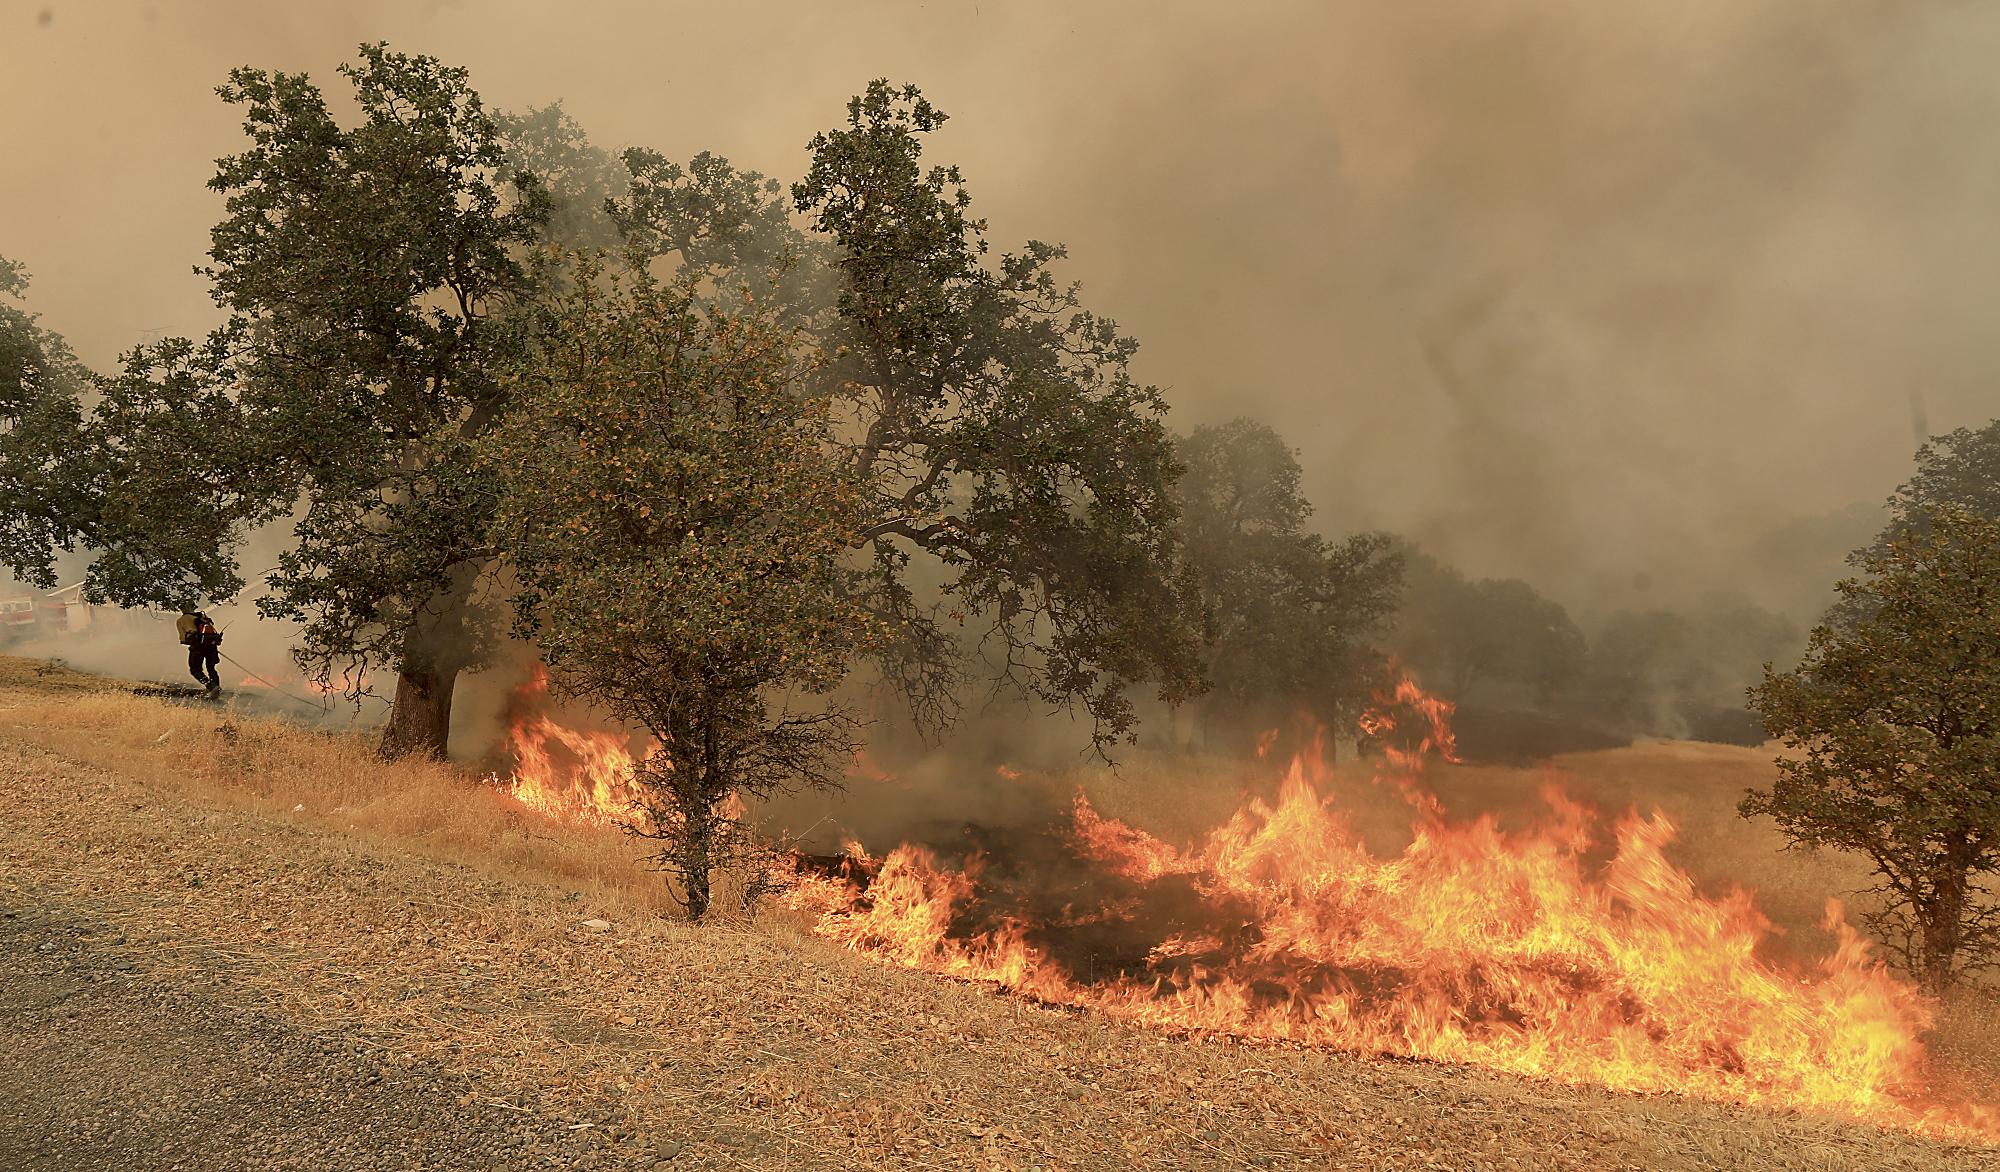 California_Wildfires_09071-159532.jpg49574506